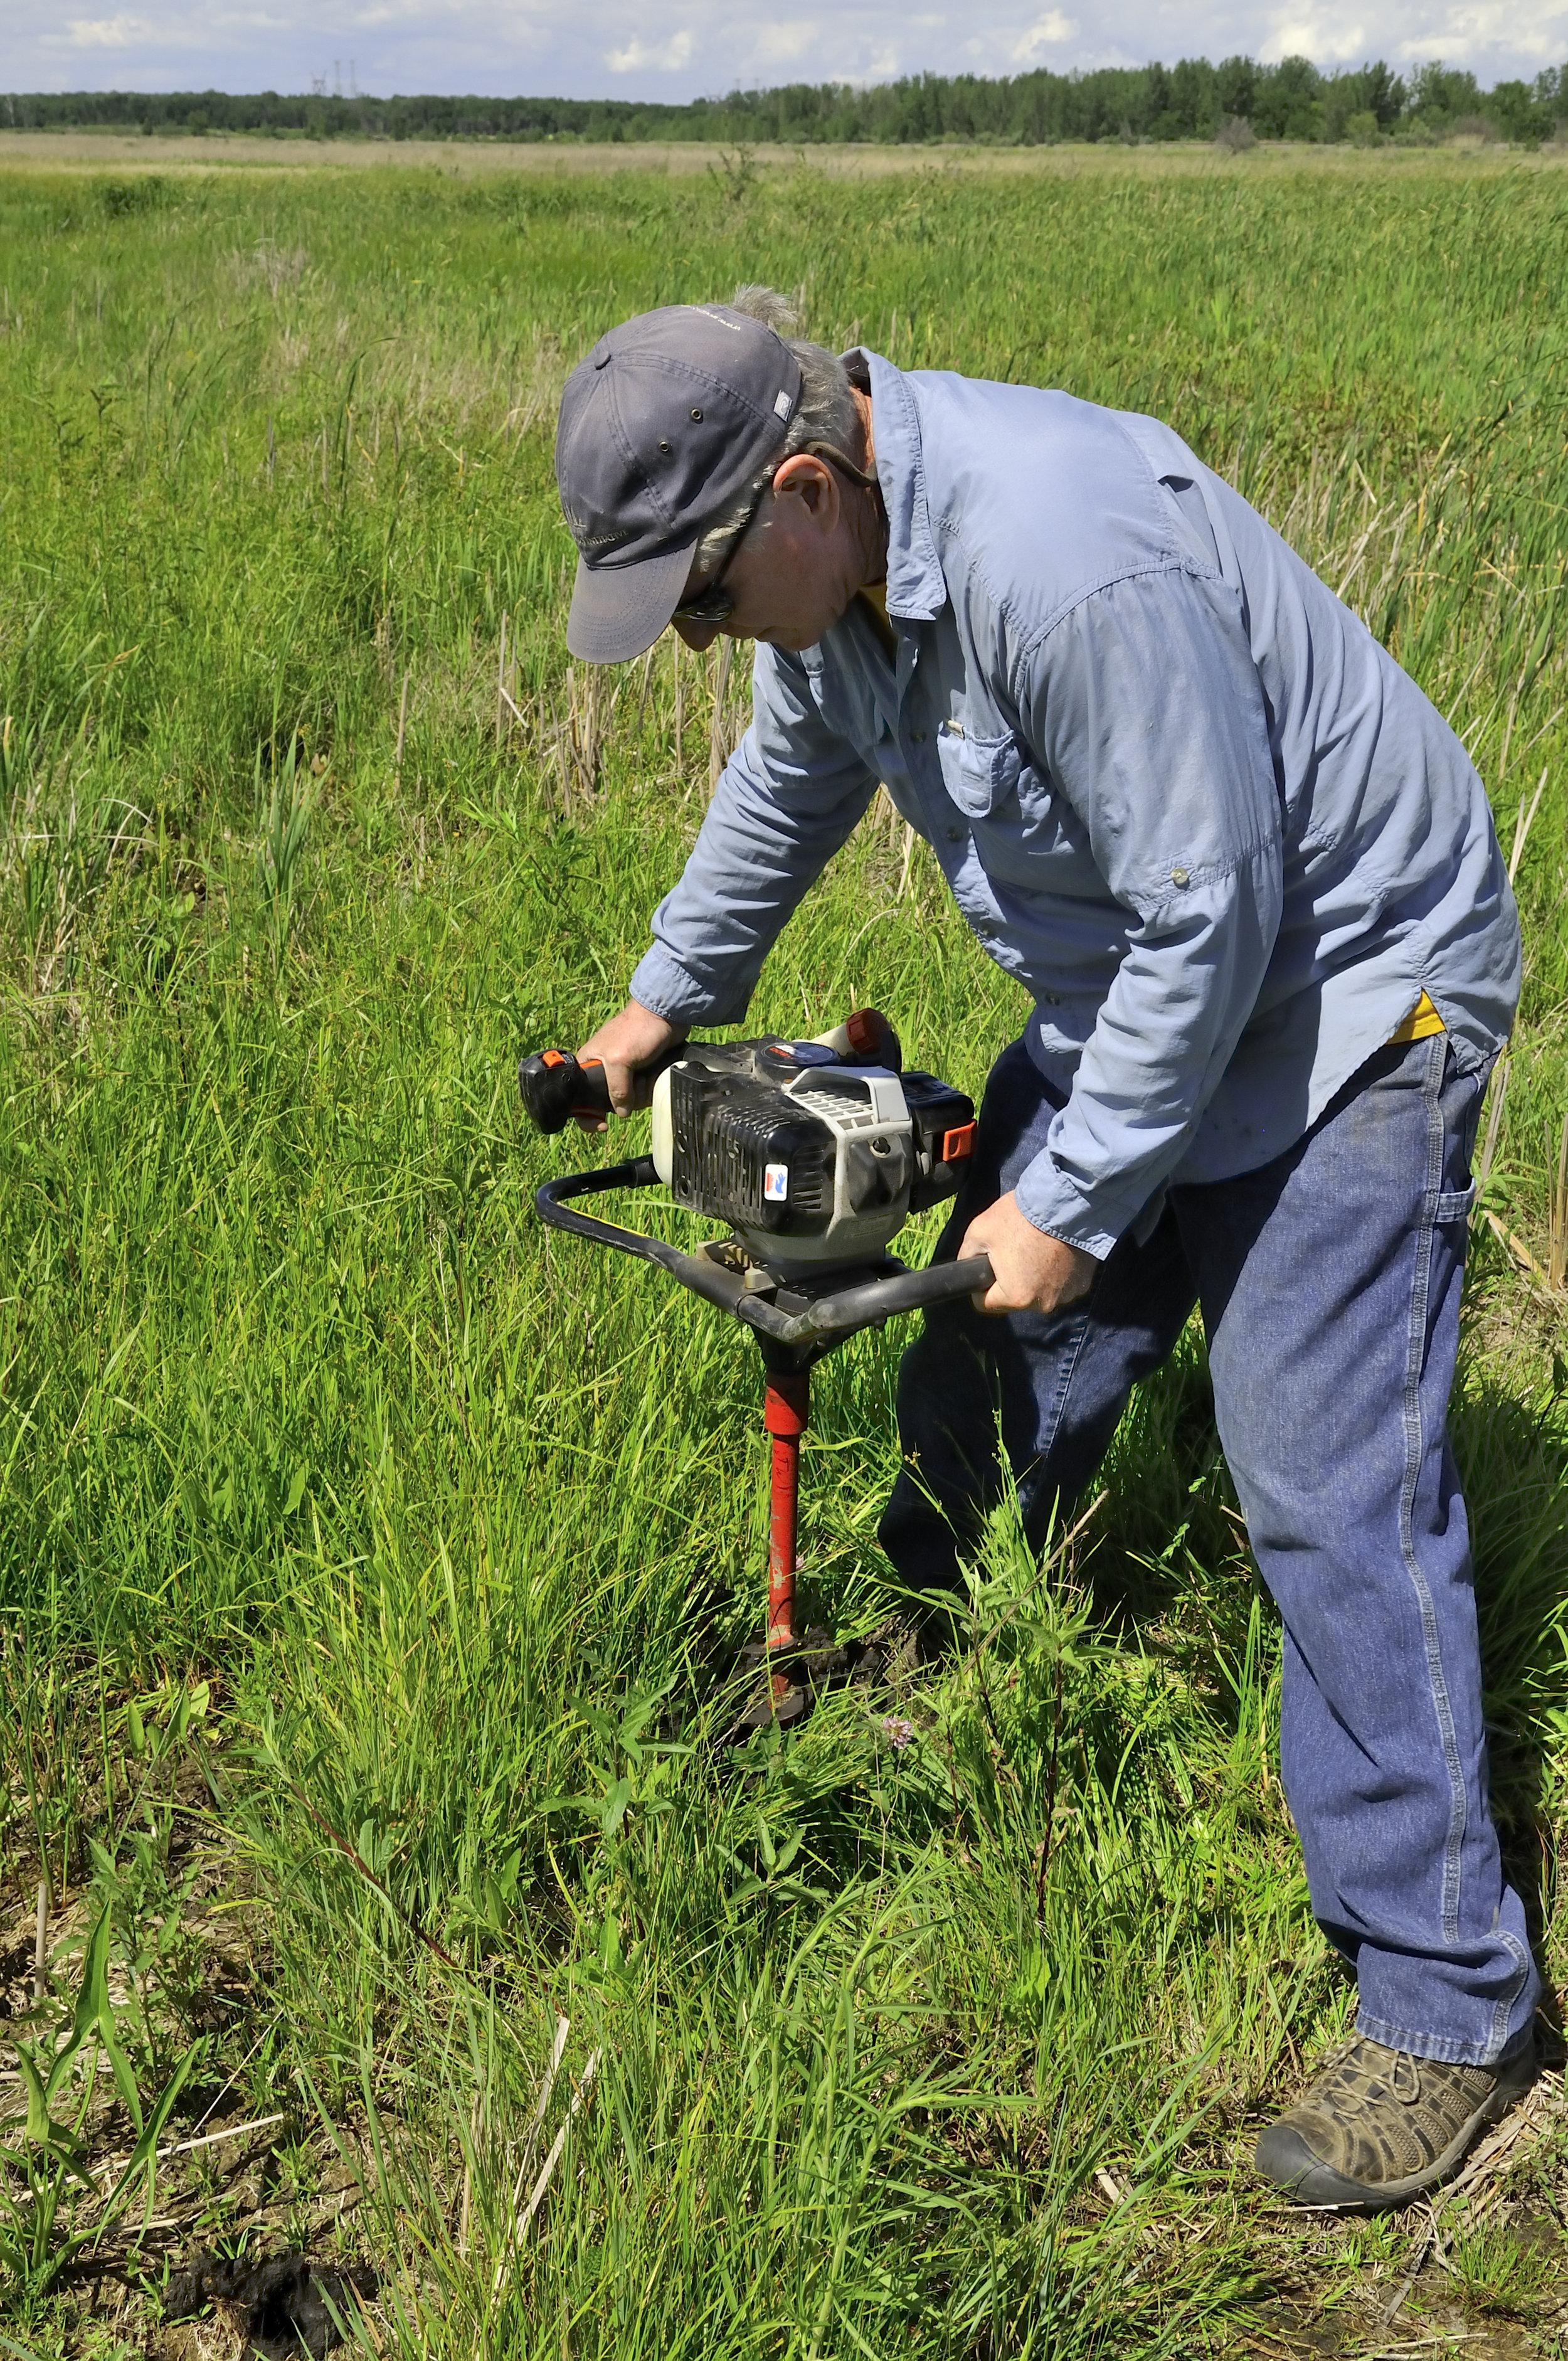 TWI Senior Ecologist Dr. Gary Sullivan drills a monitoring well at Lobelia Meadows at the start of restoration. Photo by Iza Redlinski/TWI.